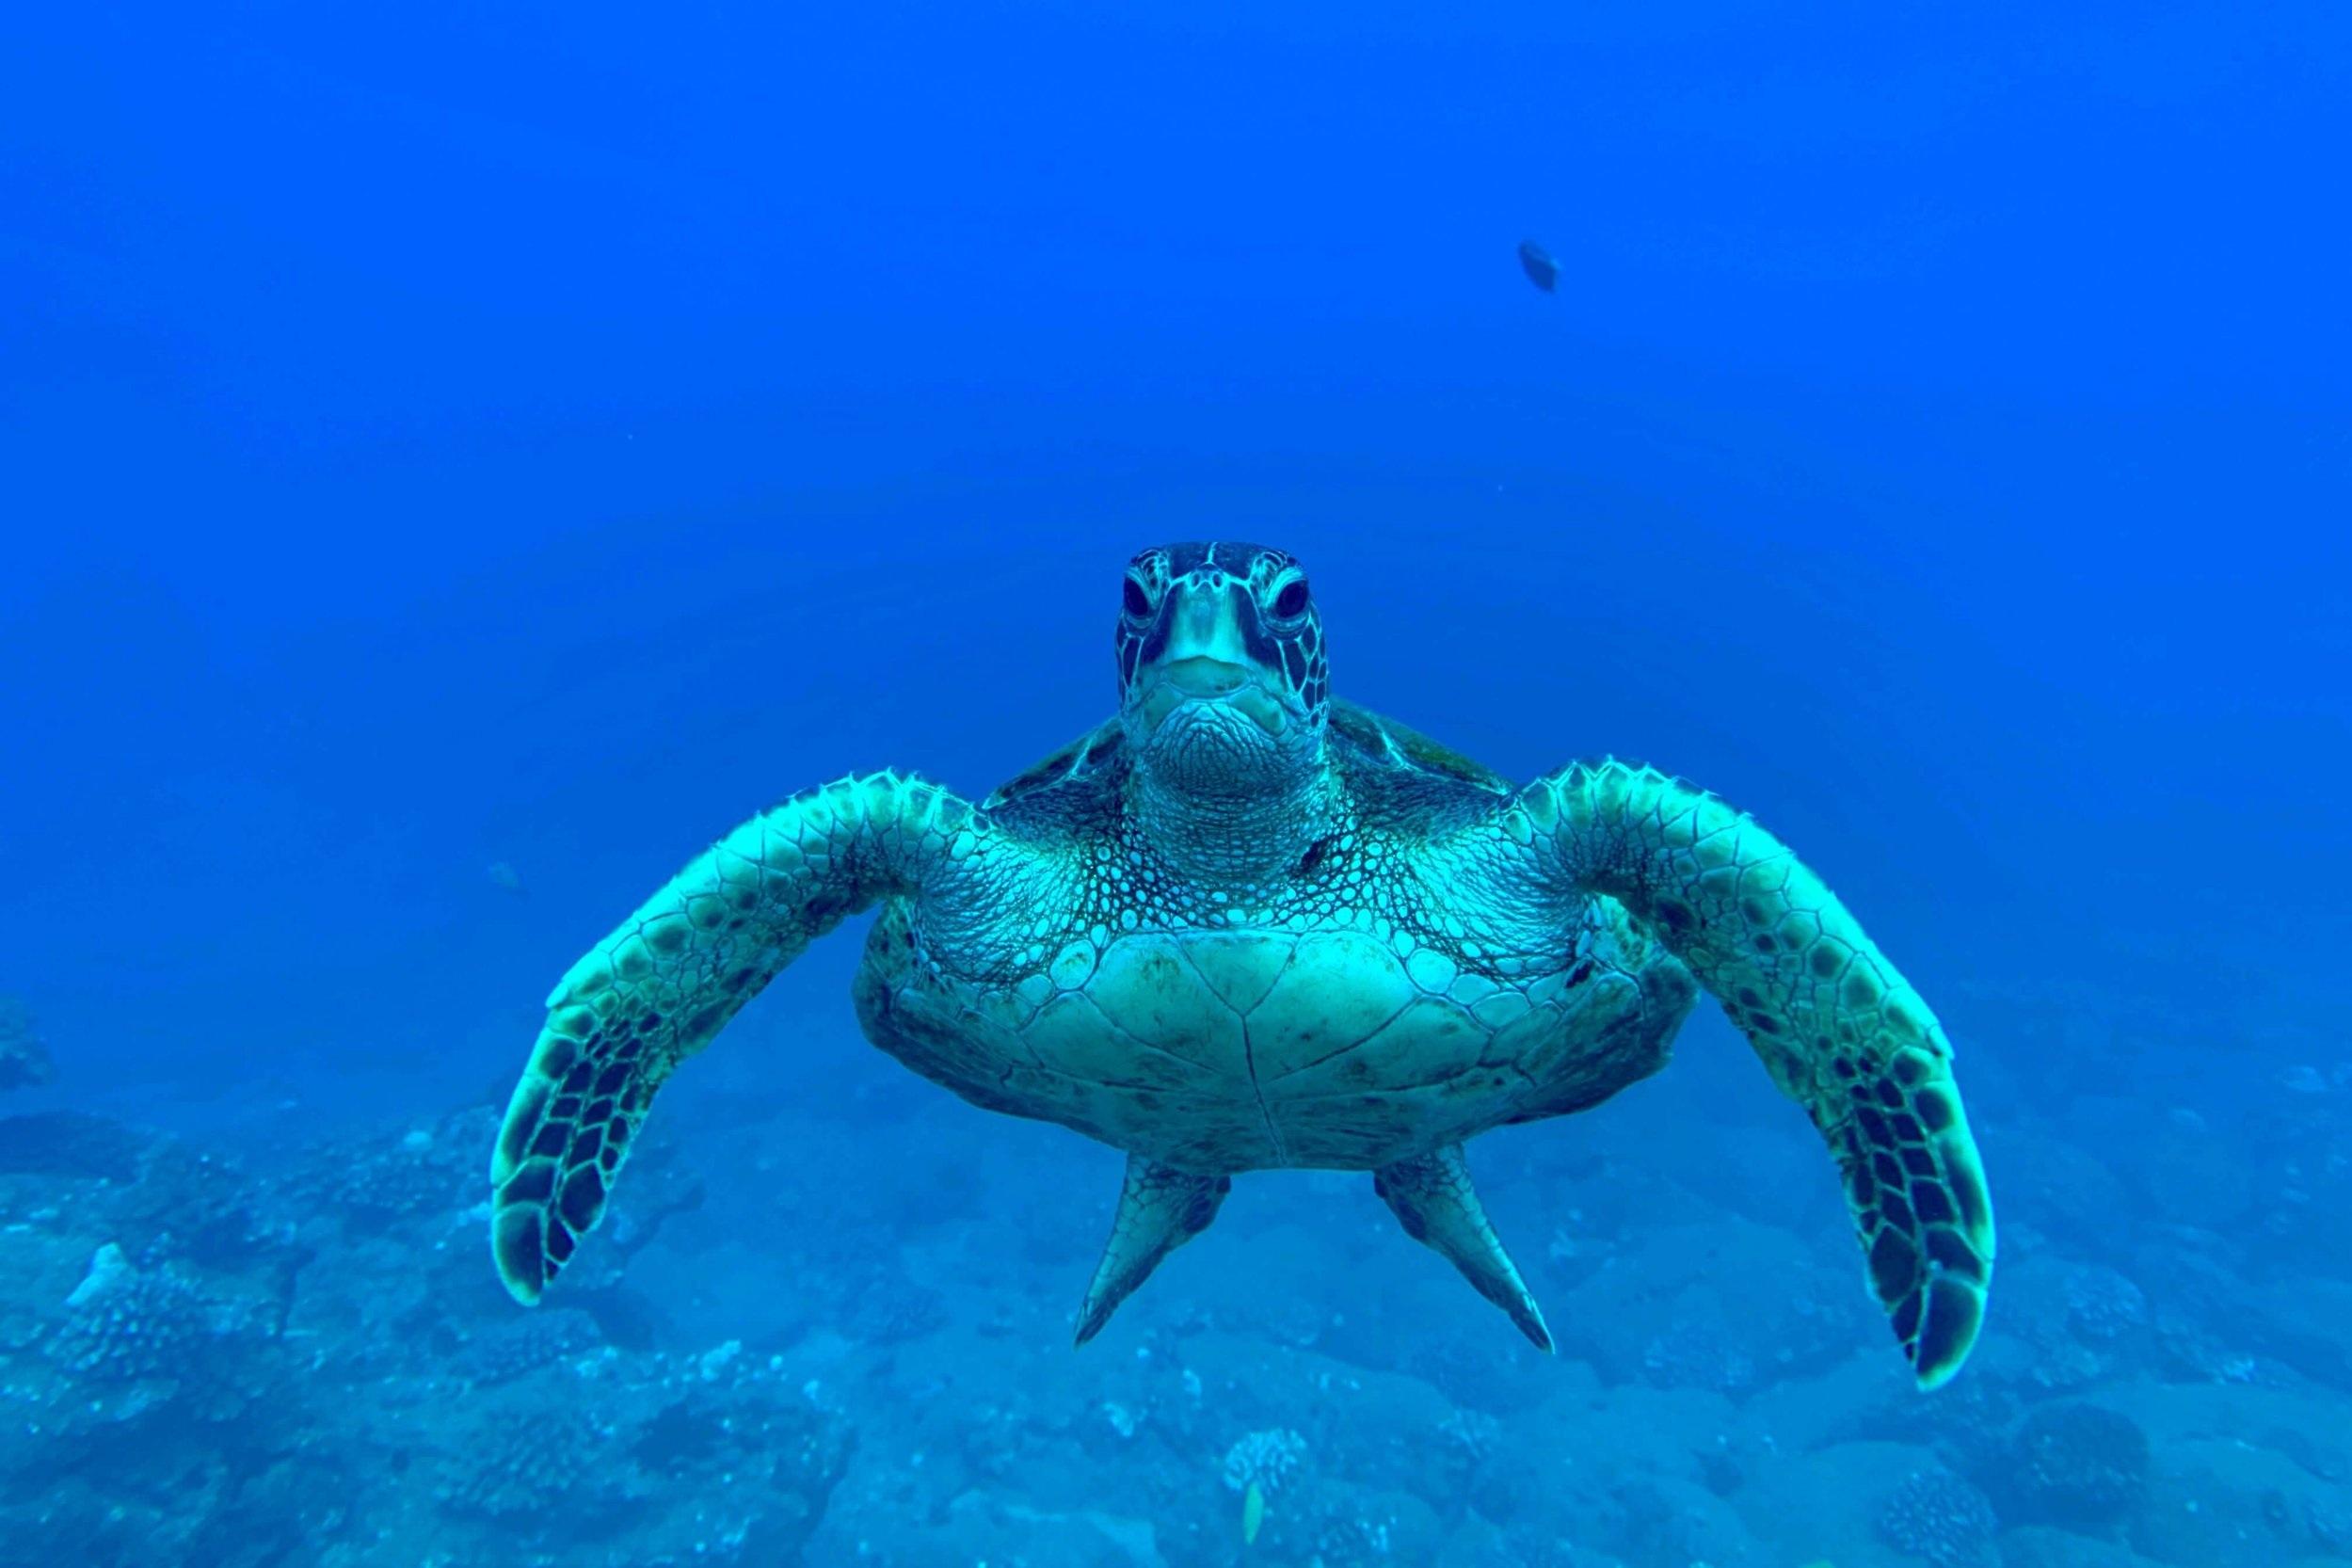 One of the many amazing sea turtles that calls Sheraton Caverns home. Photo credit: Josh Childress